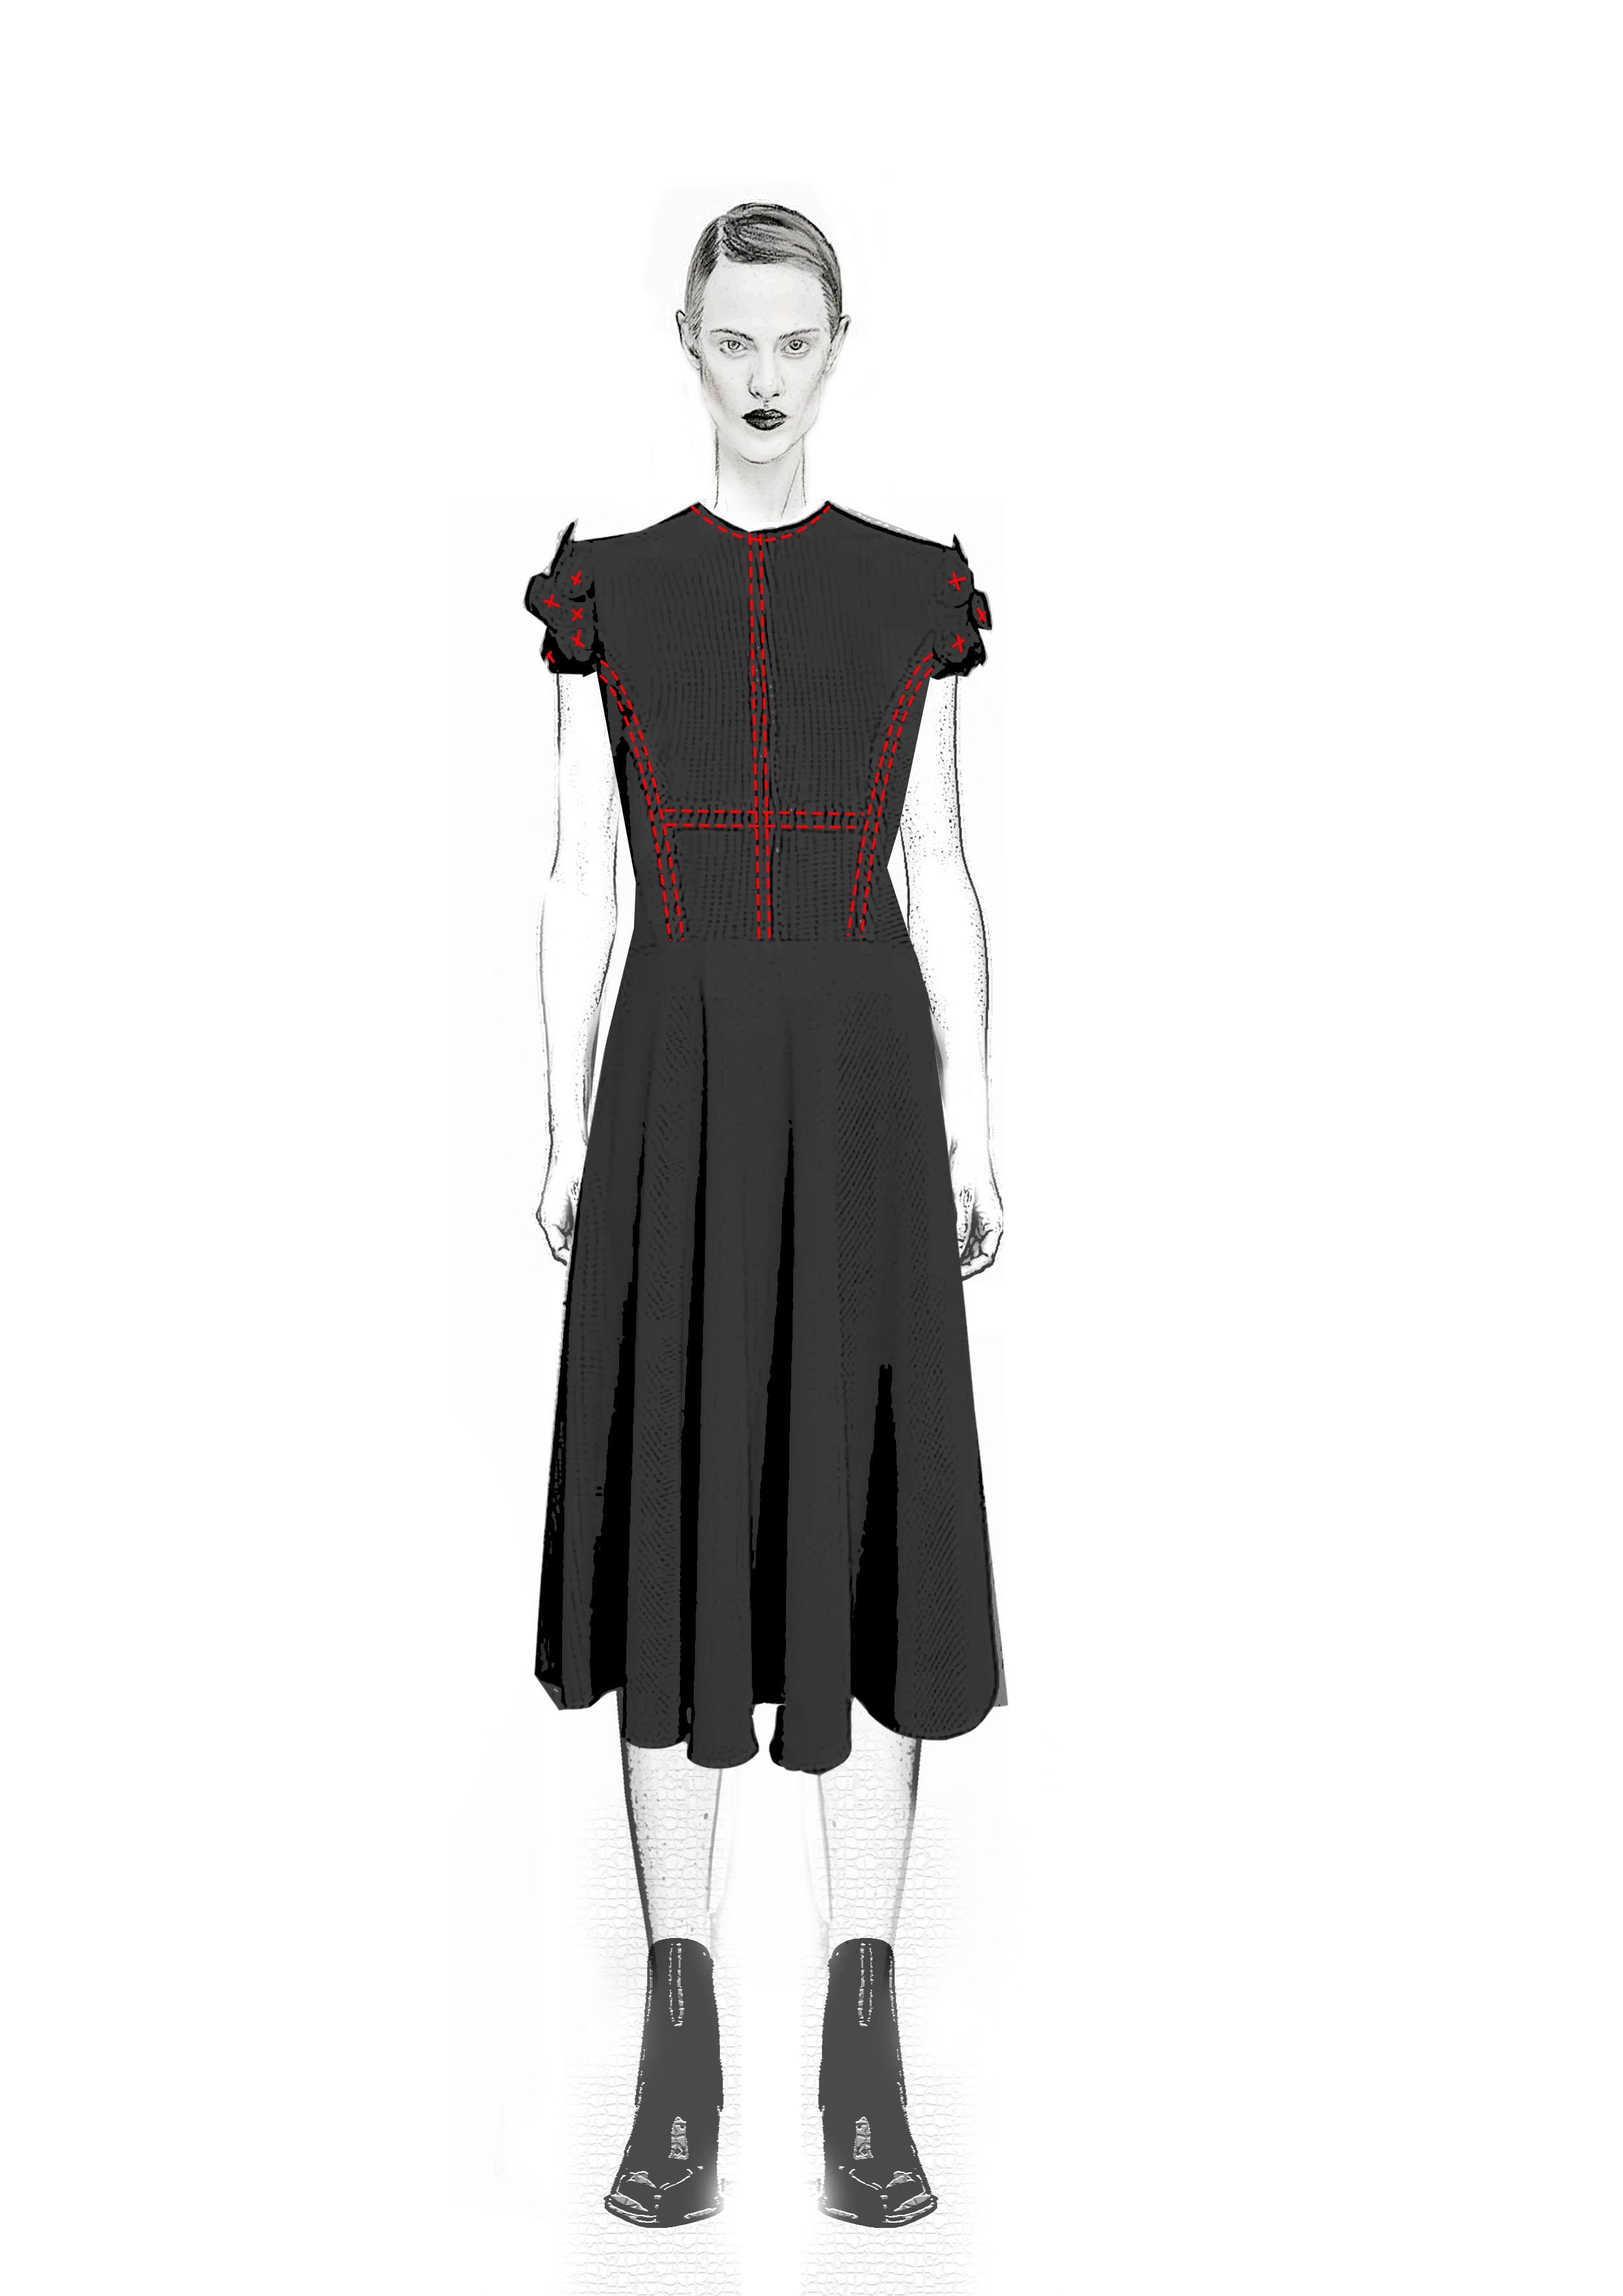 SOULAS handmade dress - Copy.jpg